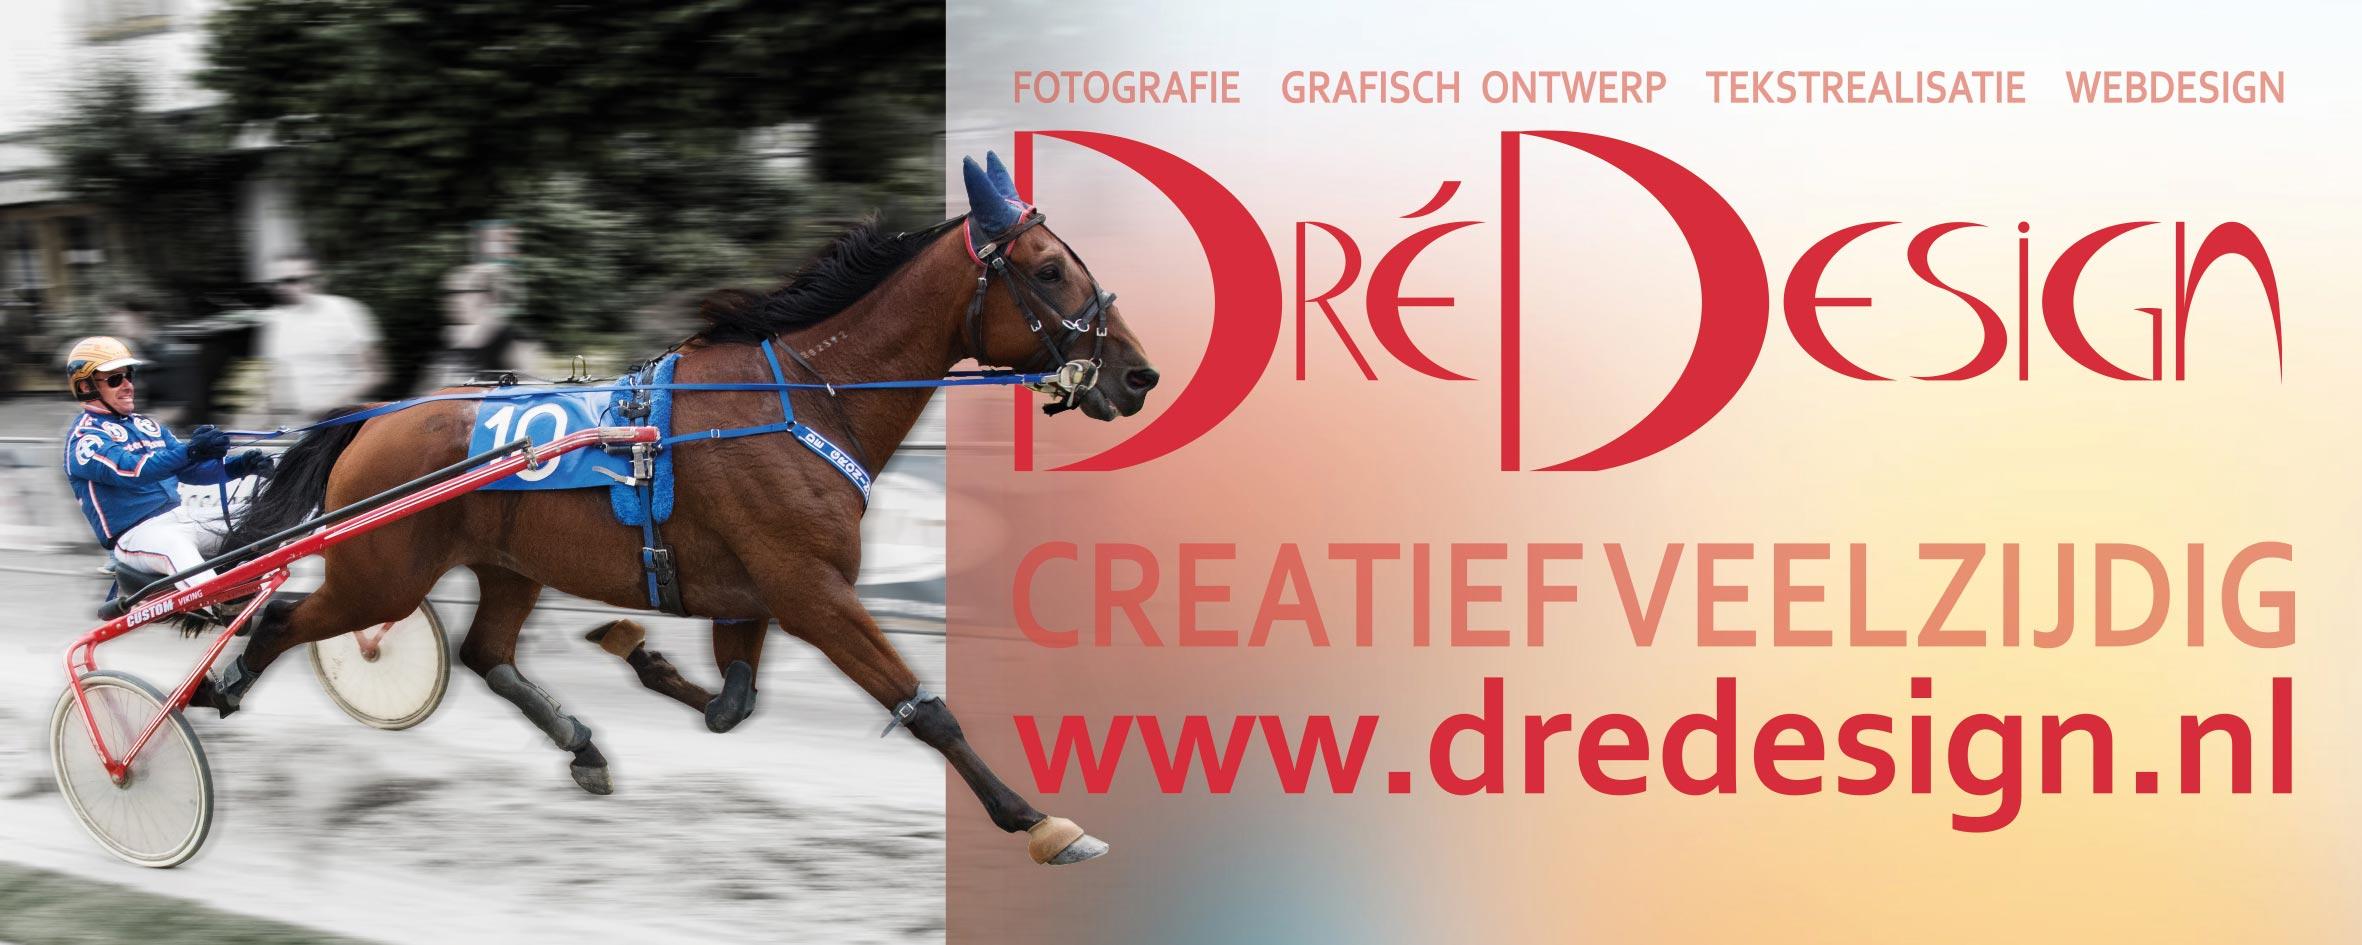 Dré Design Sponsorbanner Kortebaan Egmond